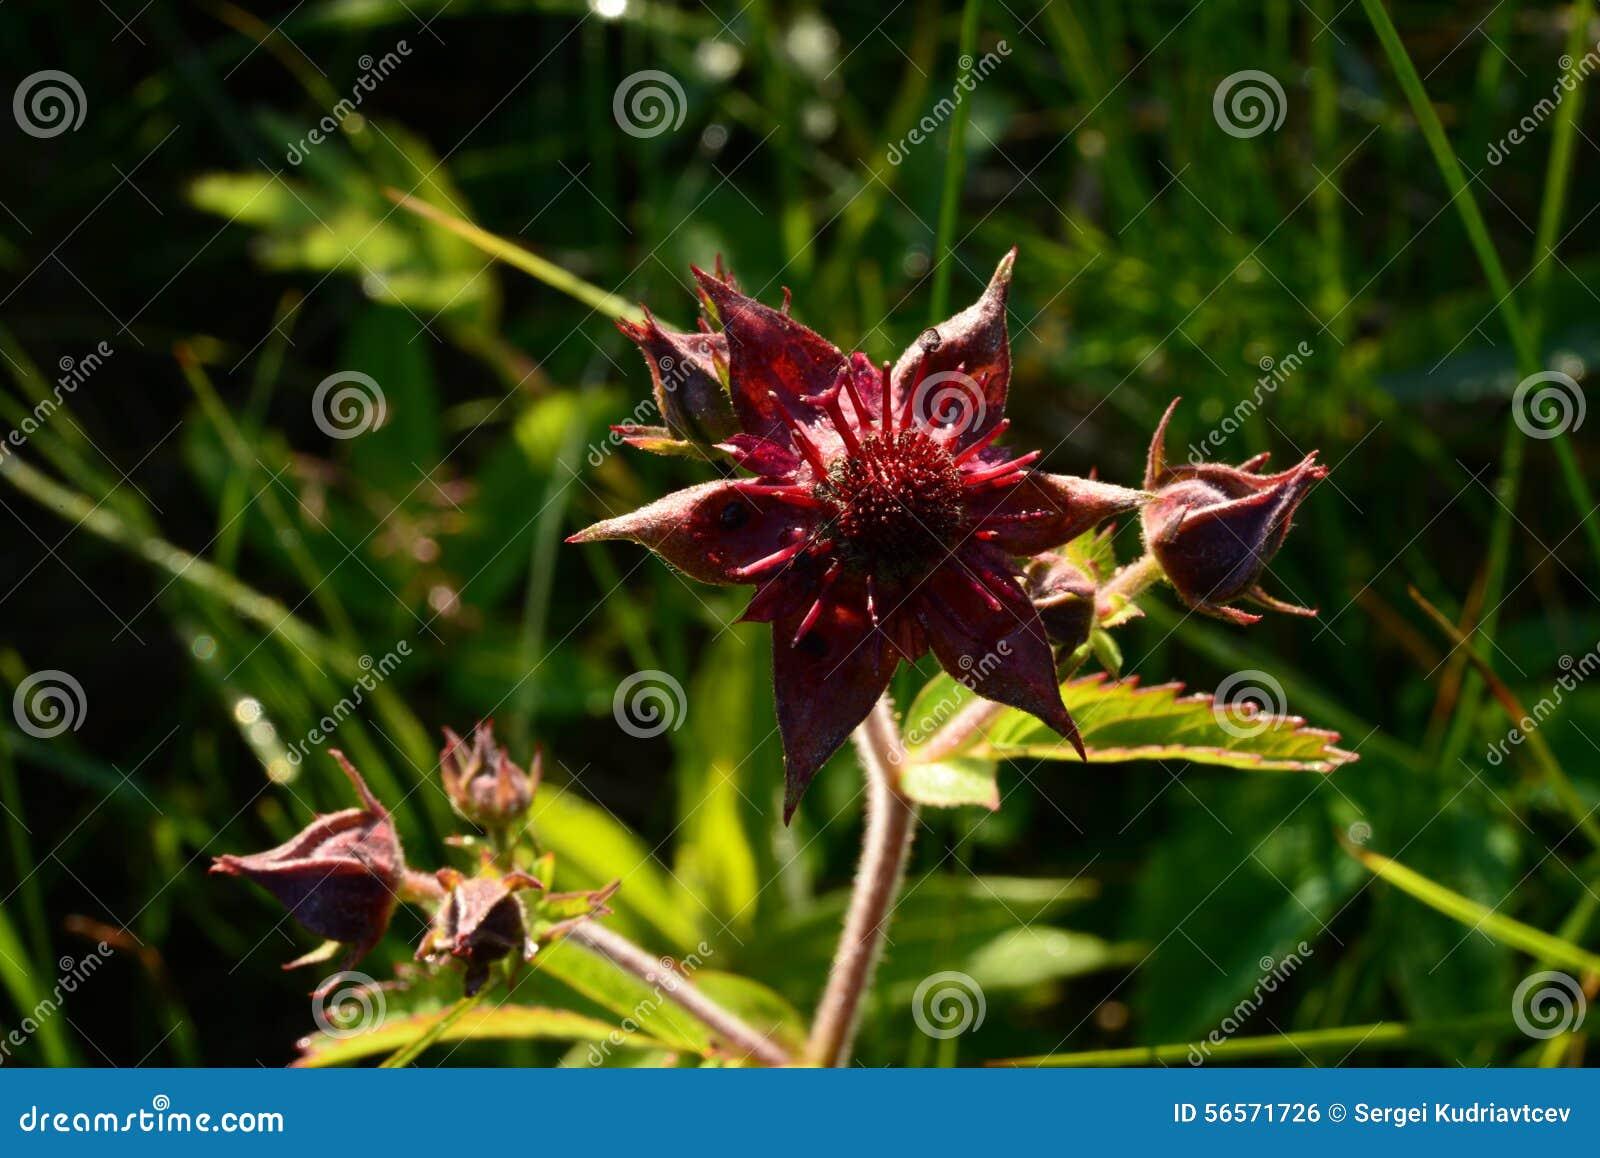 Download Πρωί αρχών του καλοκαιριού έλους λουλουδιών Cinquefoil στη χλόη θάμνων Στοκ Εικόνες - εικόνα από λουλούδι, φυτό: 56571726